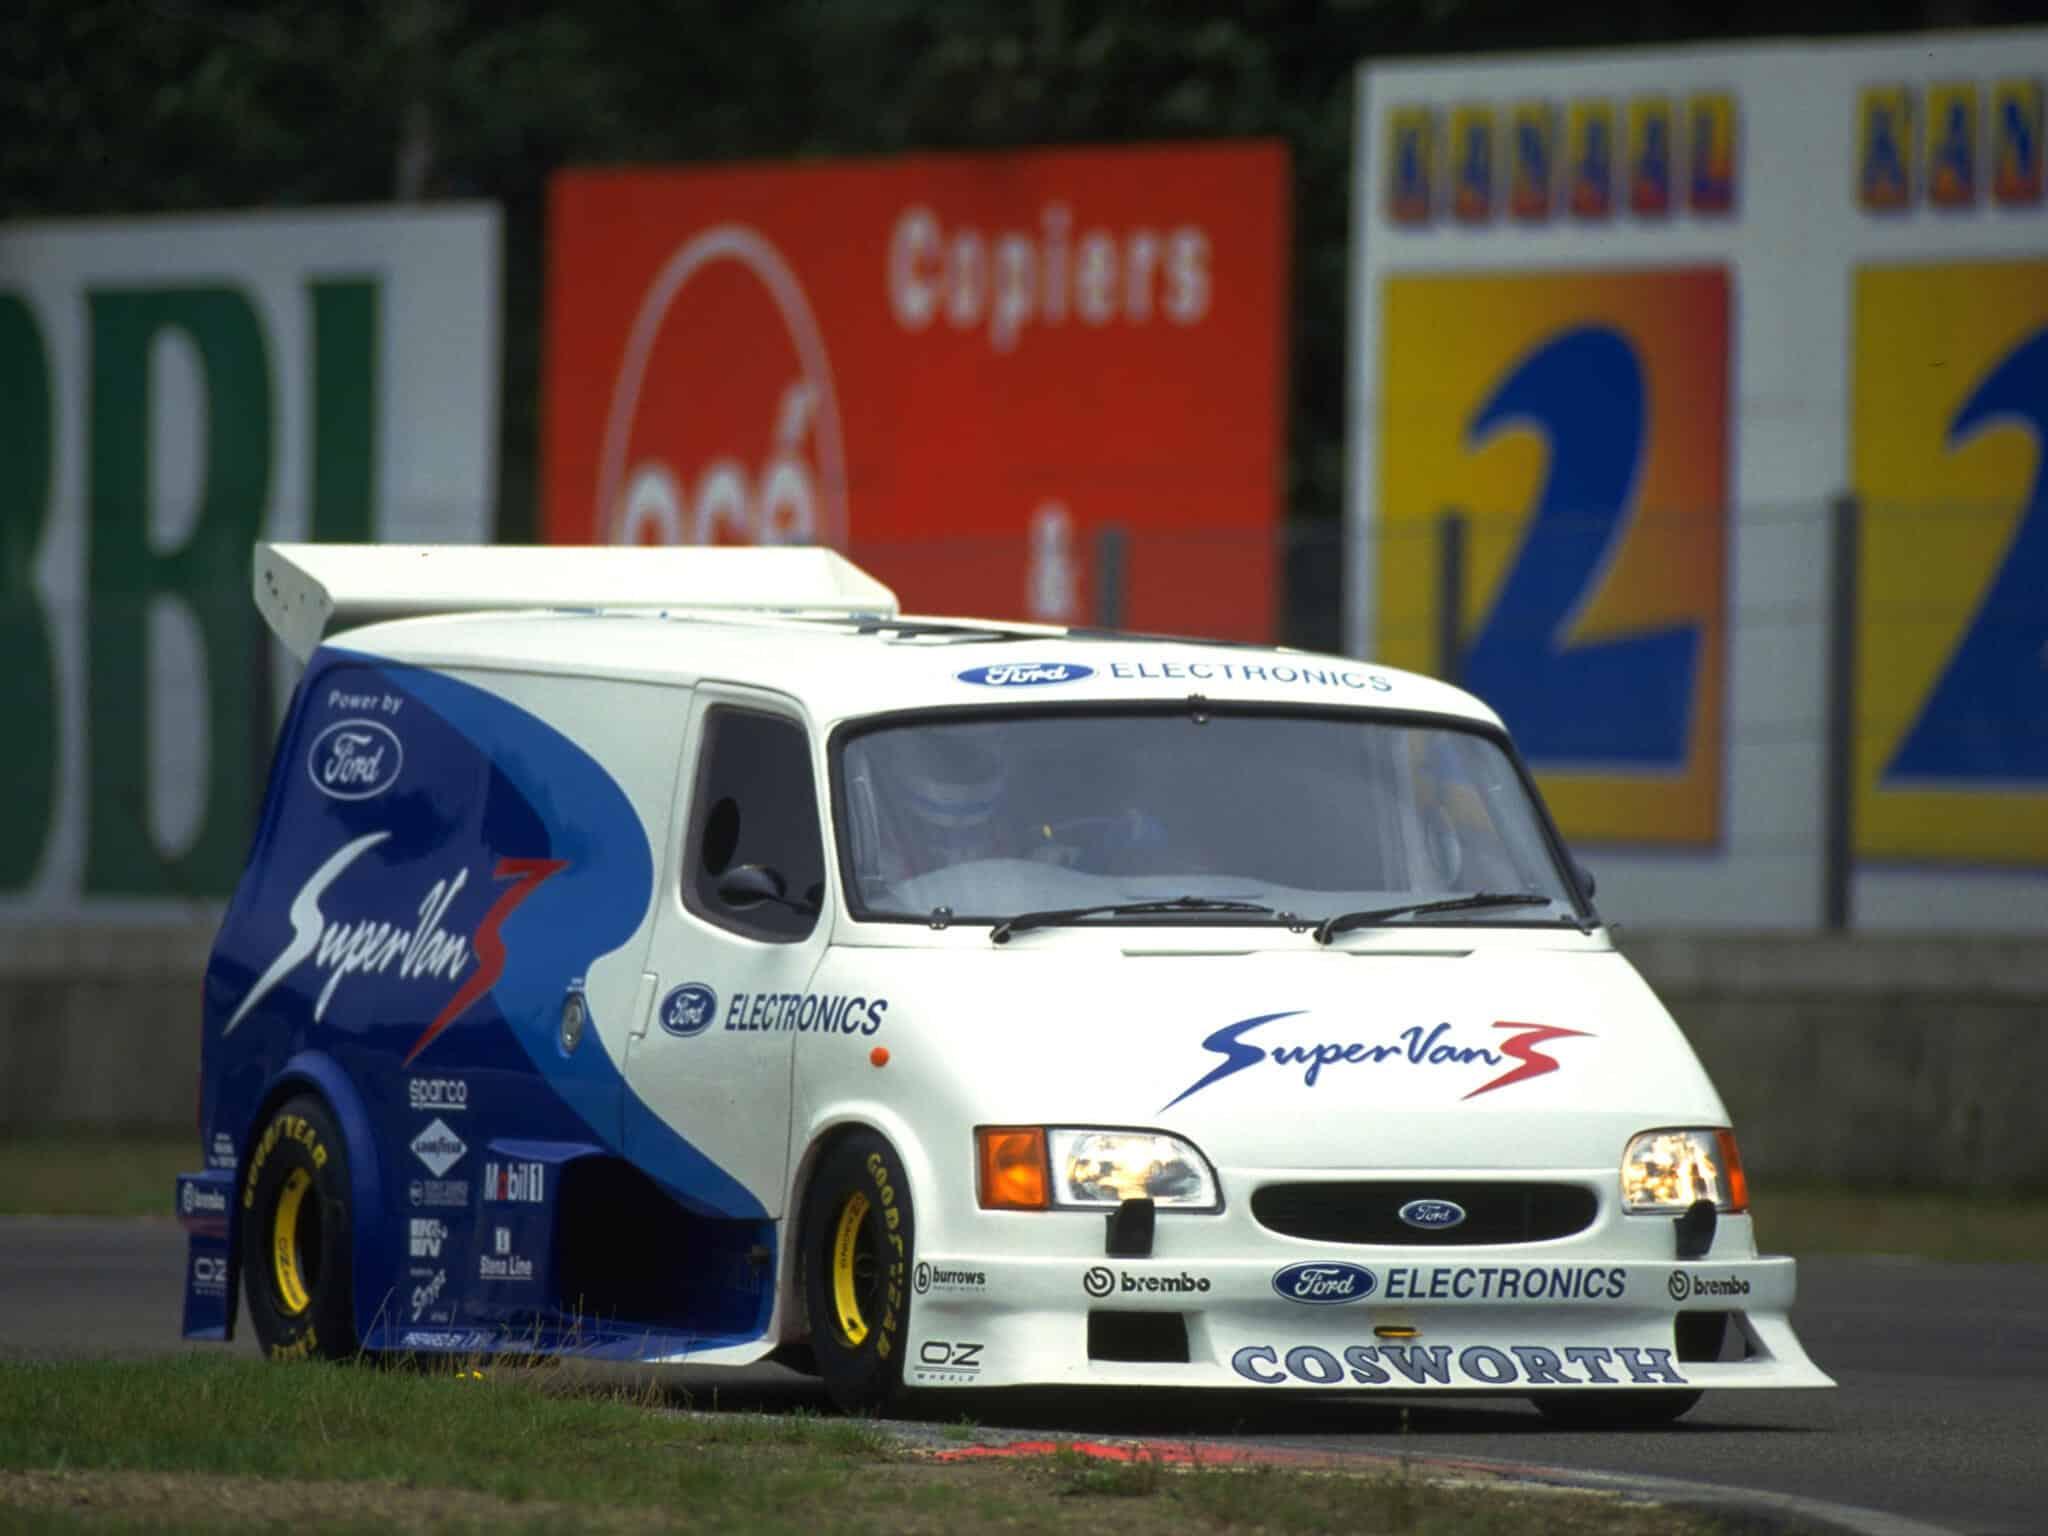 Ford Transit Supervan 1995 - photo Ford